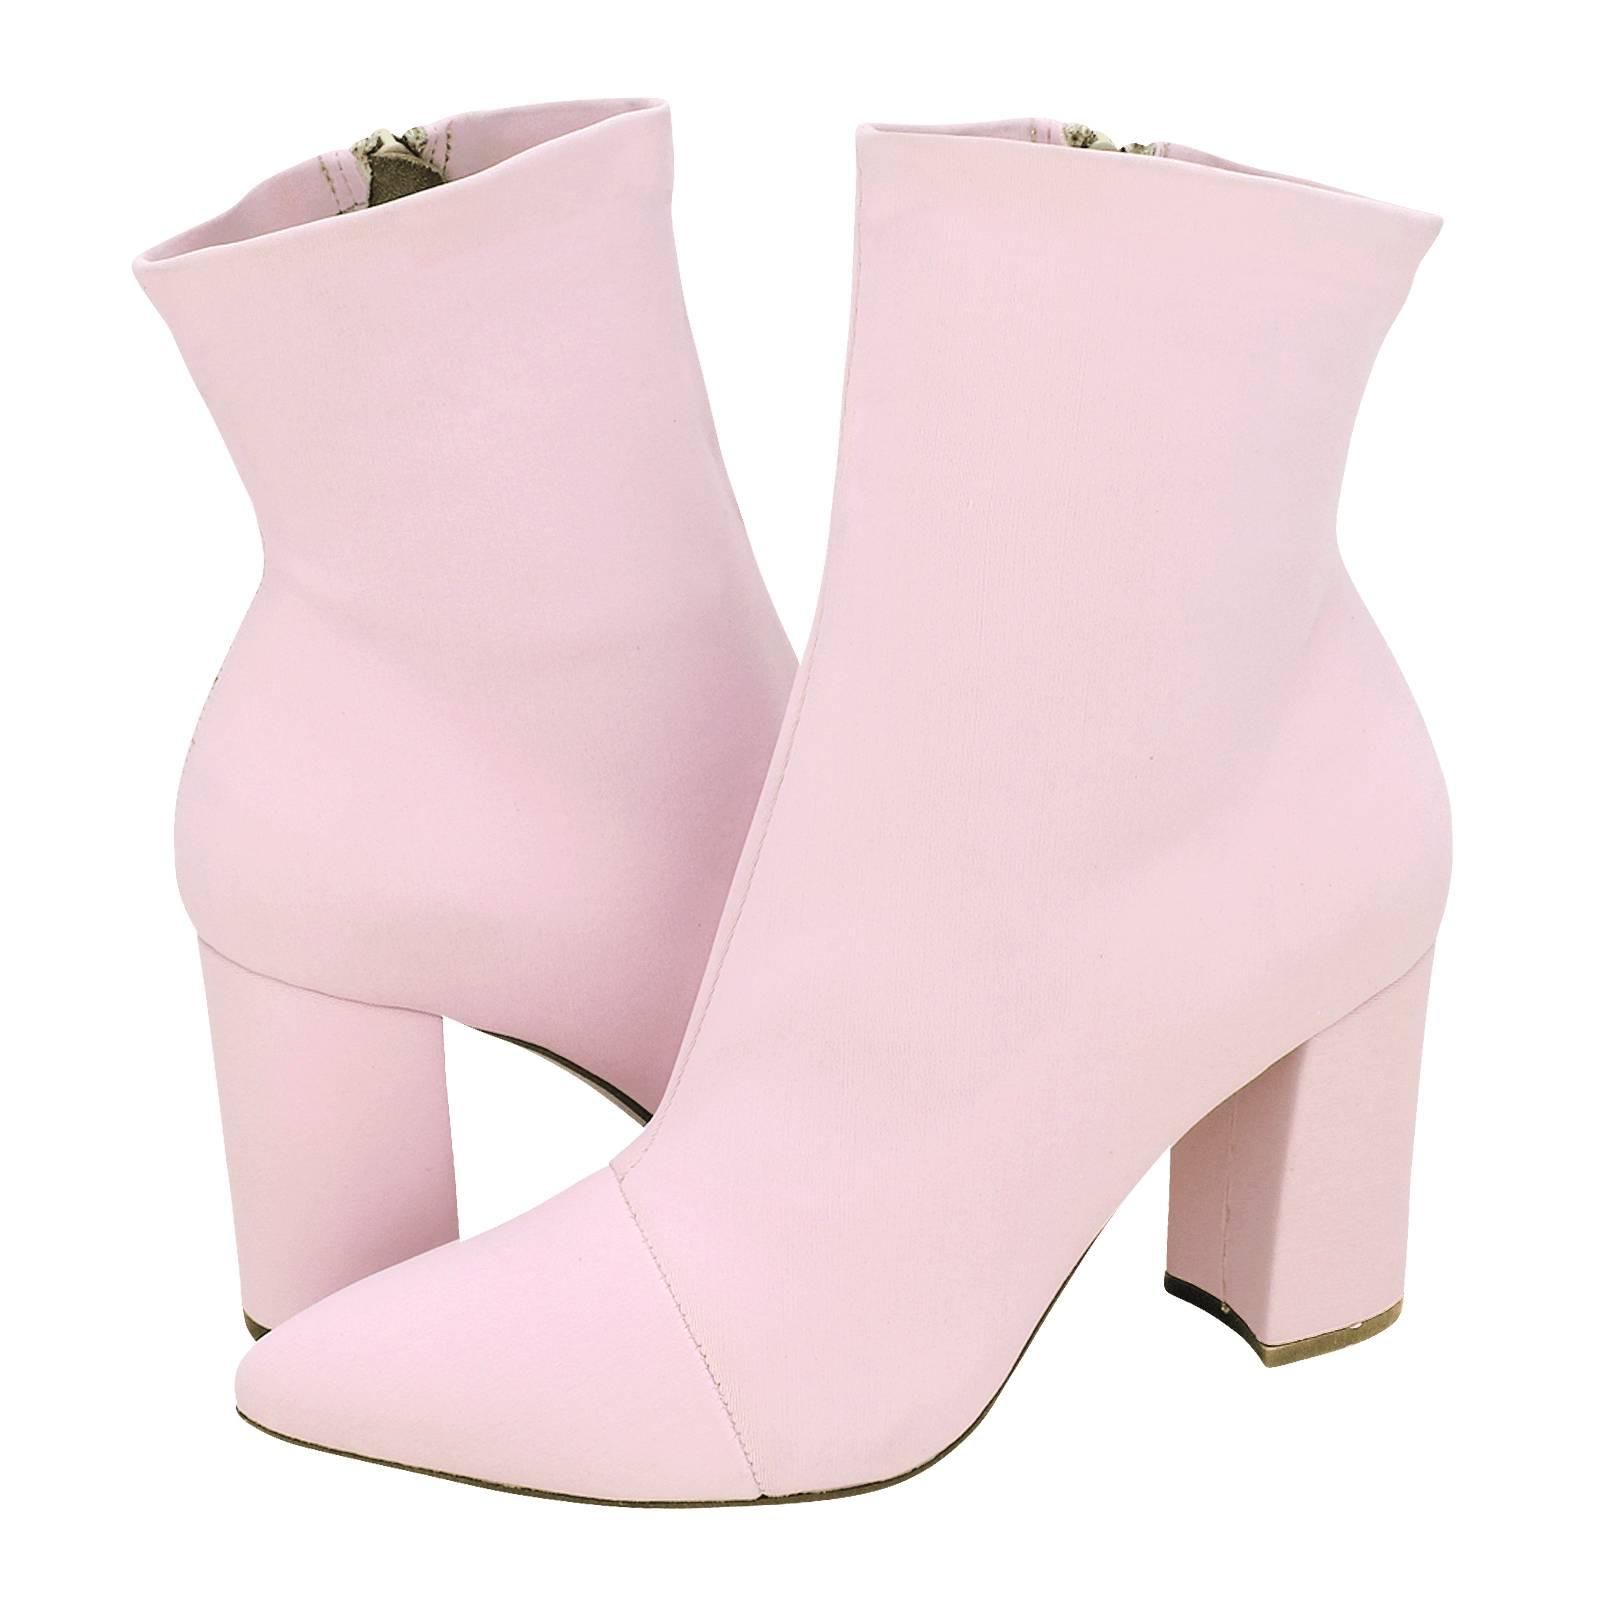 Tiffany - Esthissis Women s low boots made of lycra - Gianna Kazakou ... 5fd02ee07bb